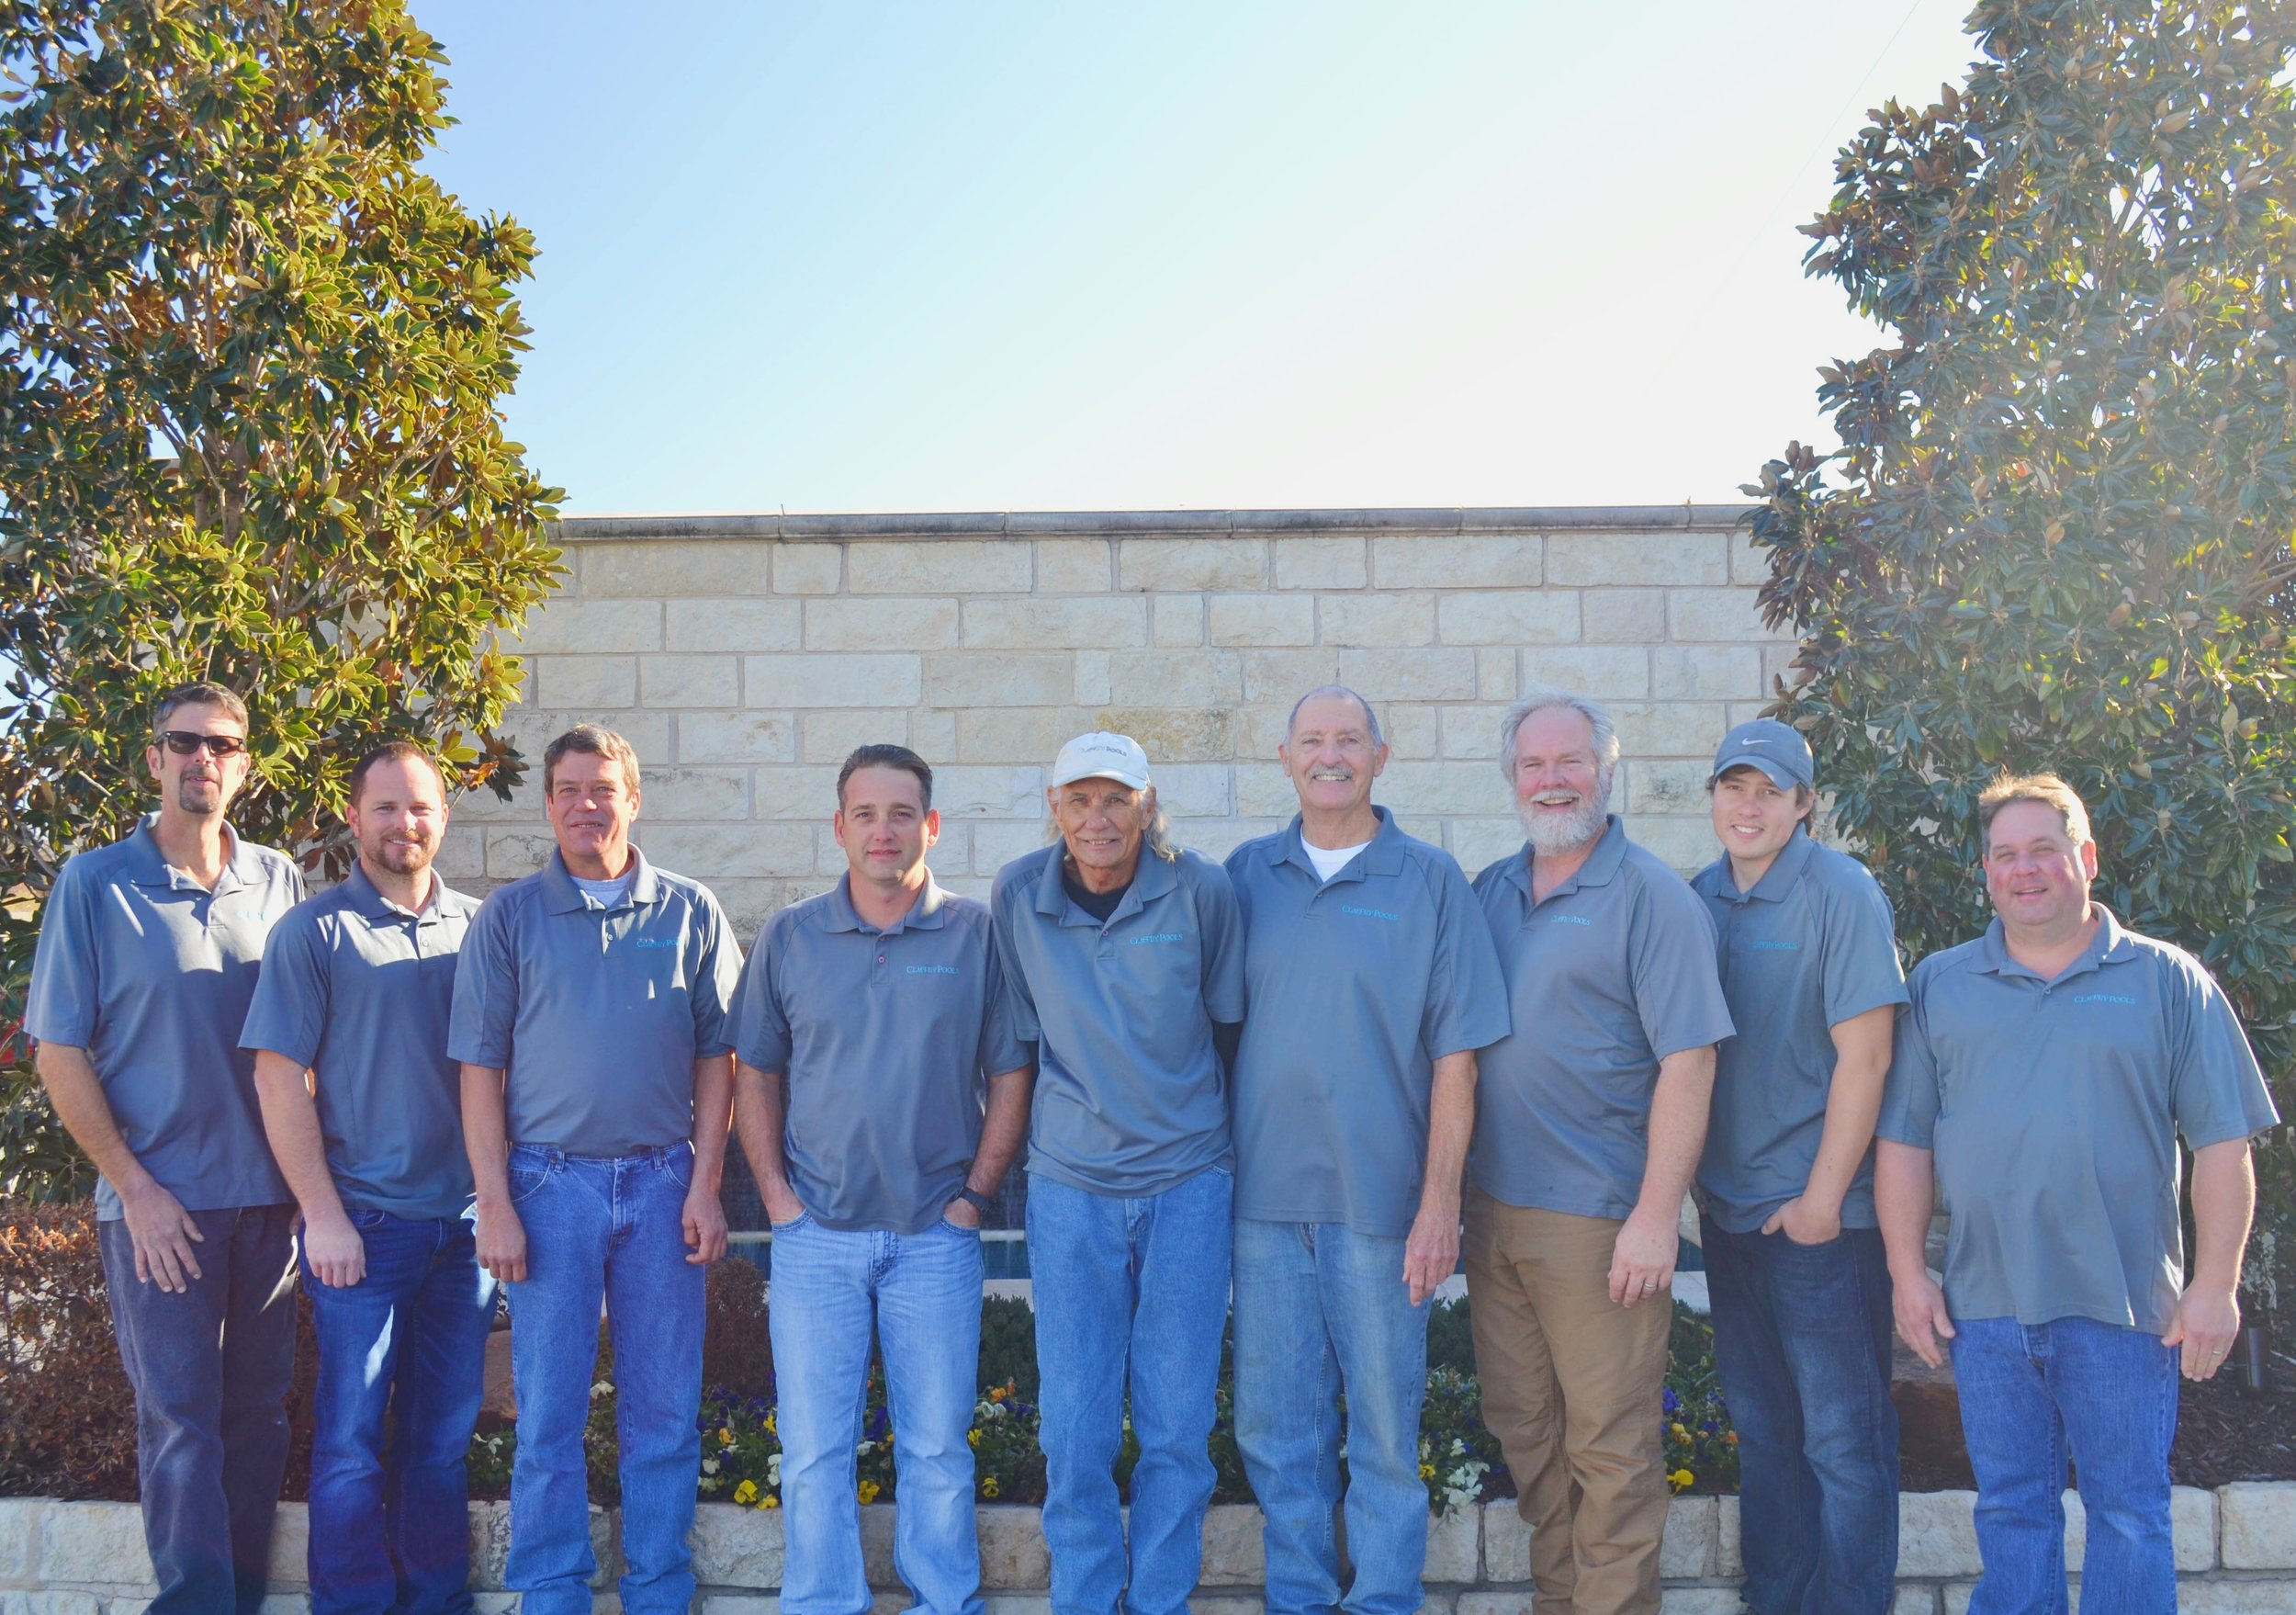 Claffey Service Team